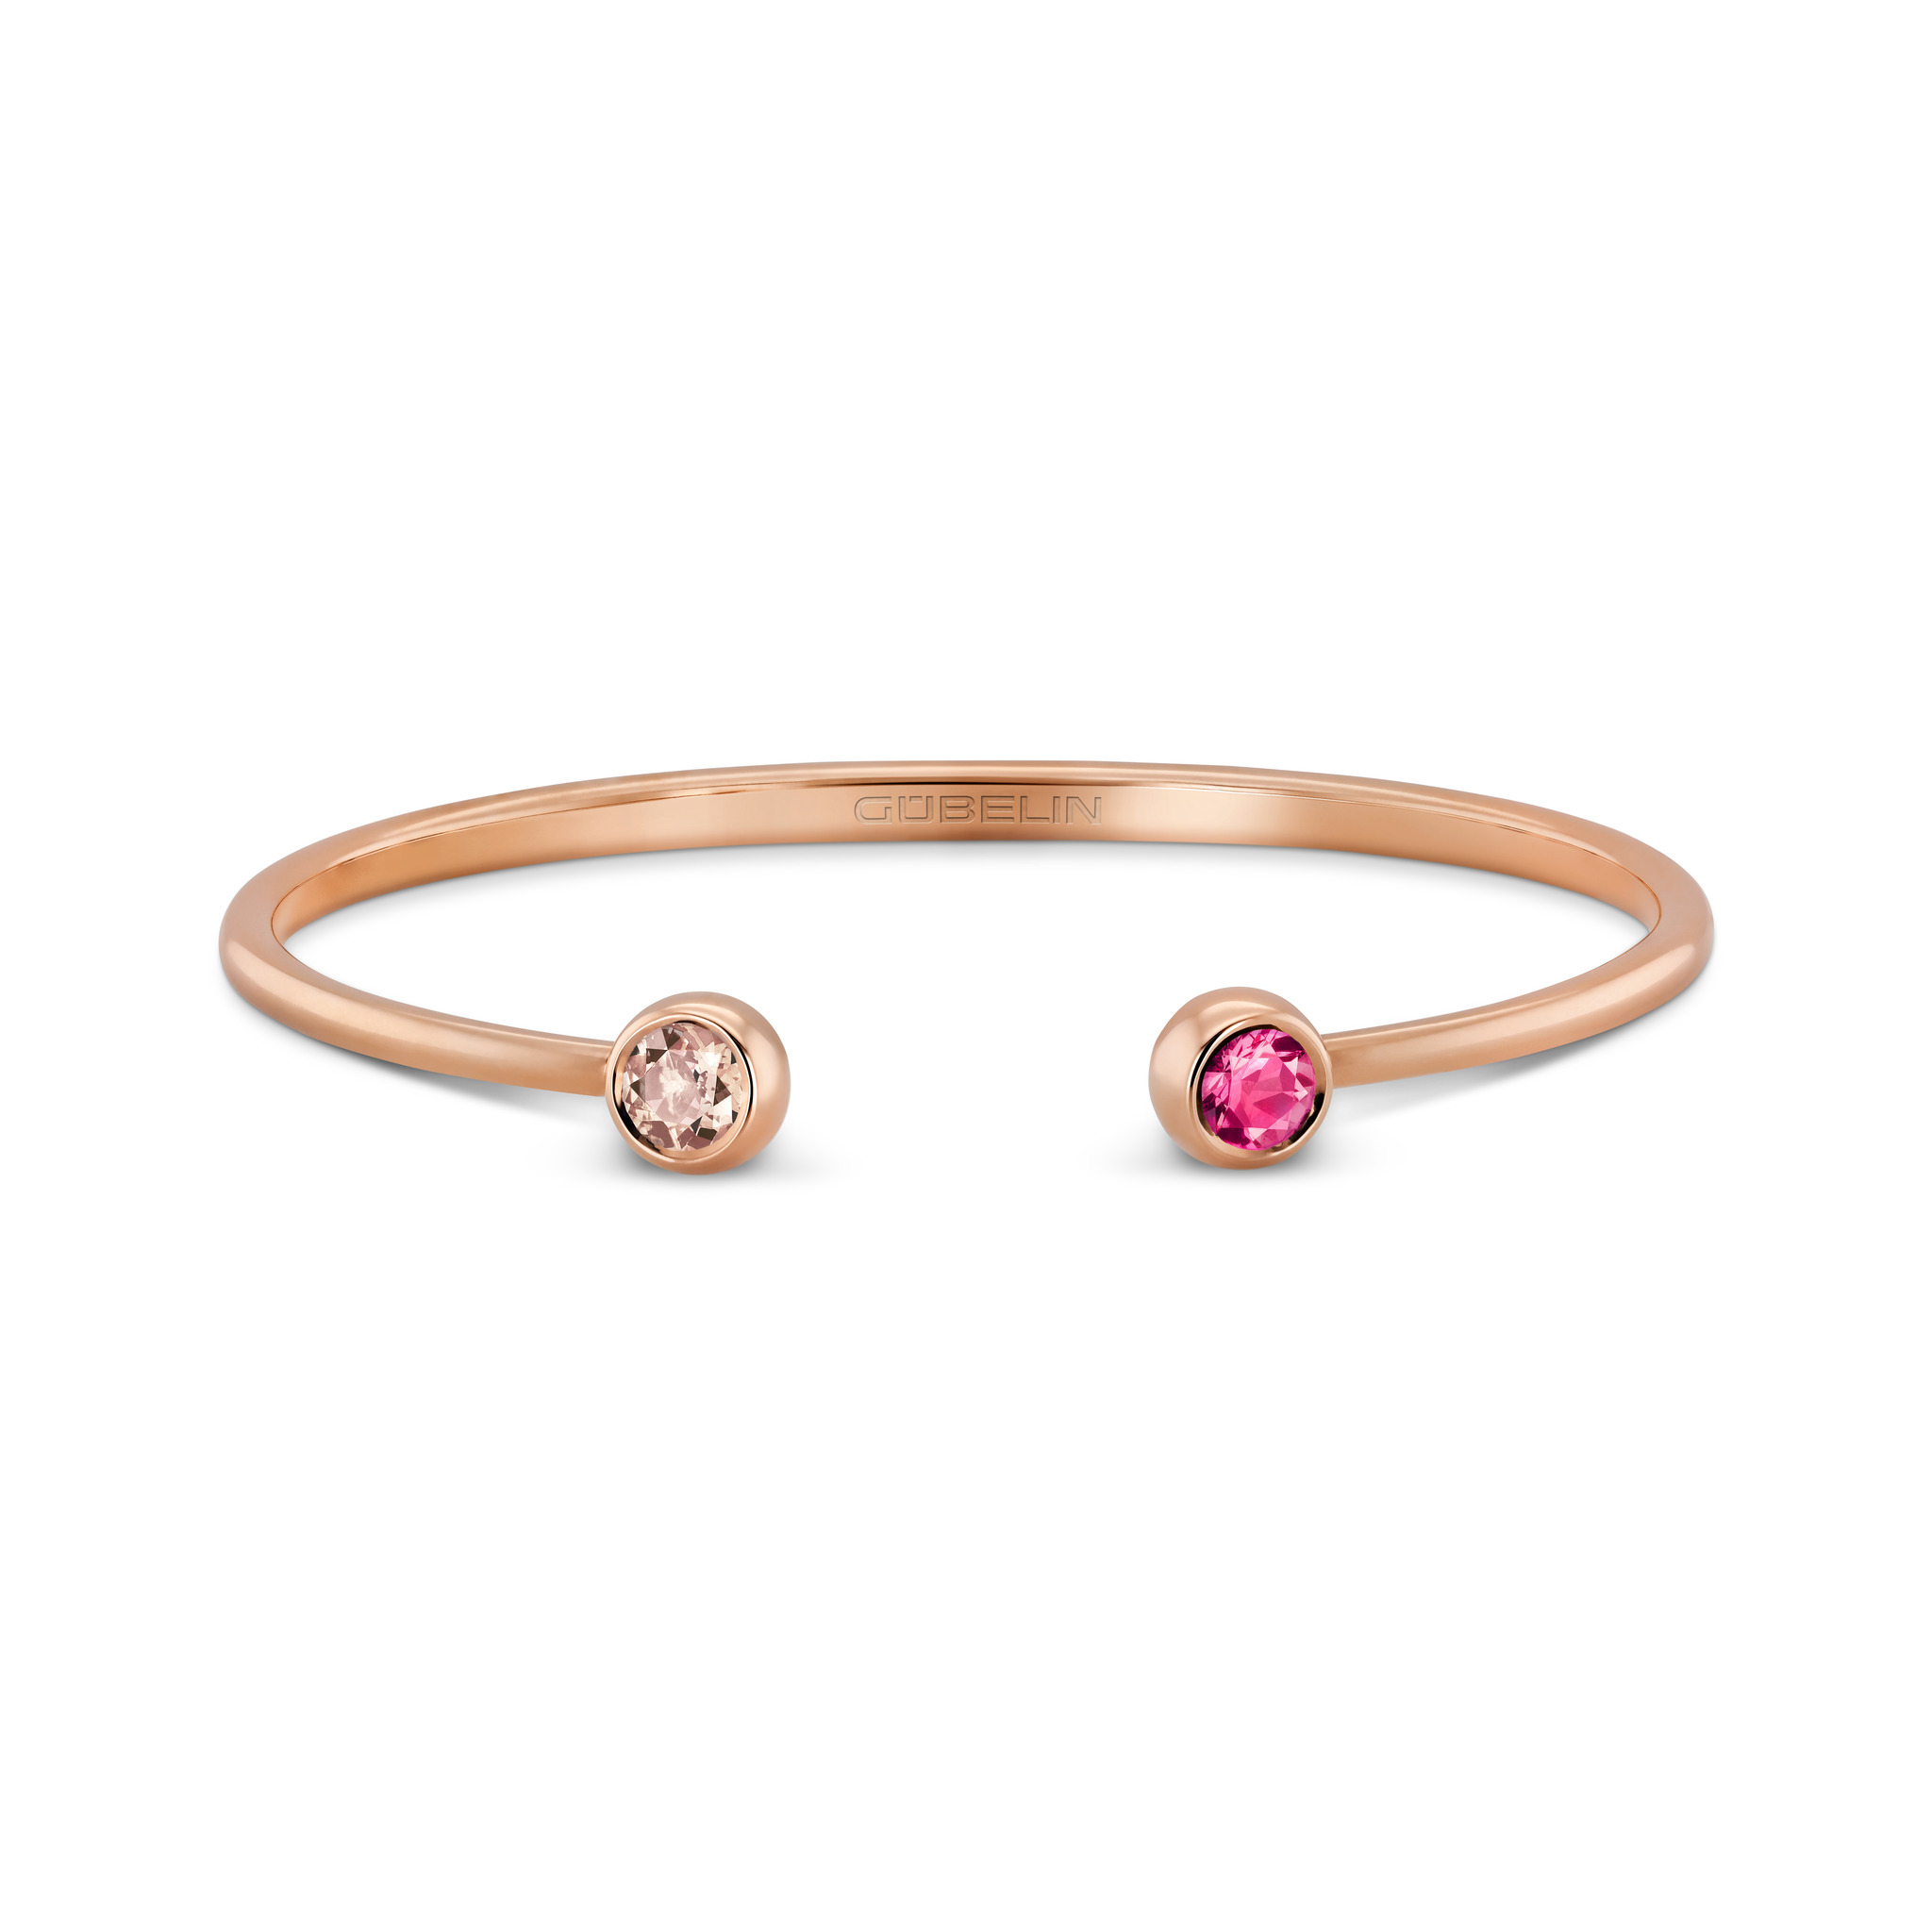 Bangle with coloured gemstones